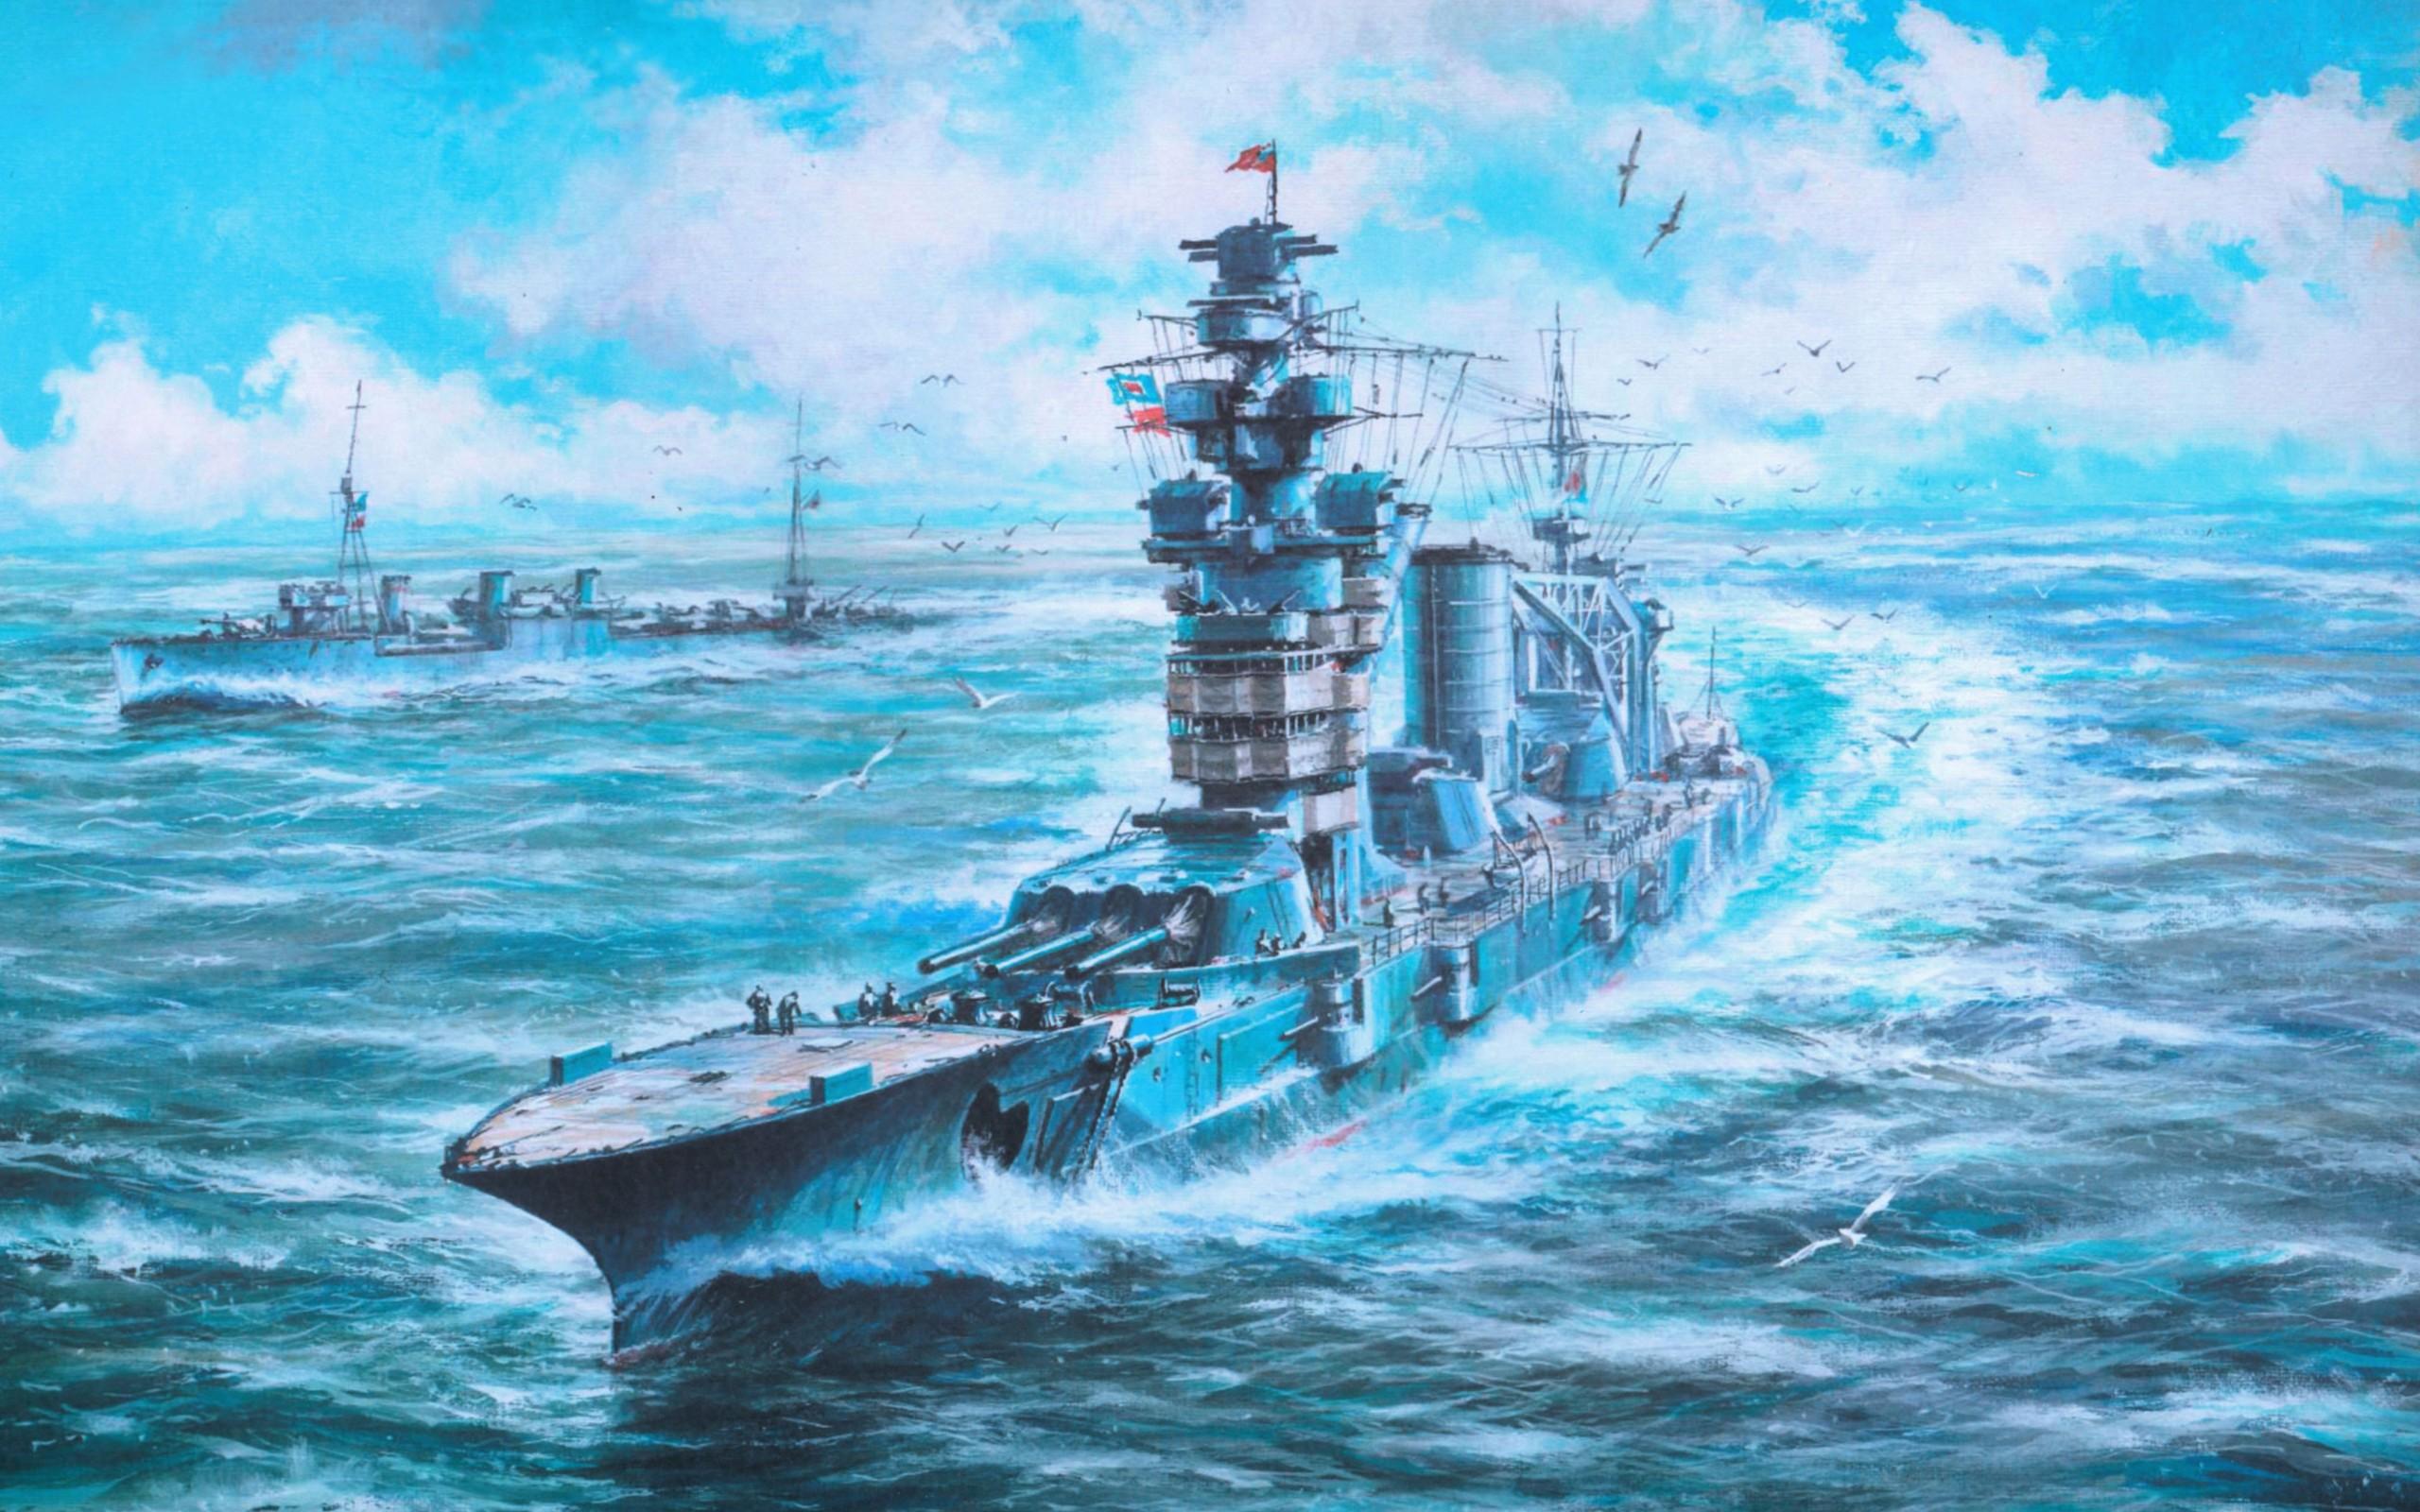 Art Sea Ship Wallpapers 2560x1600 829747